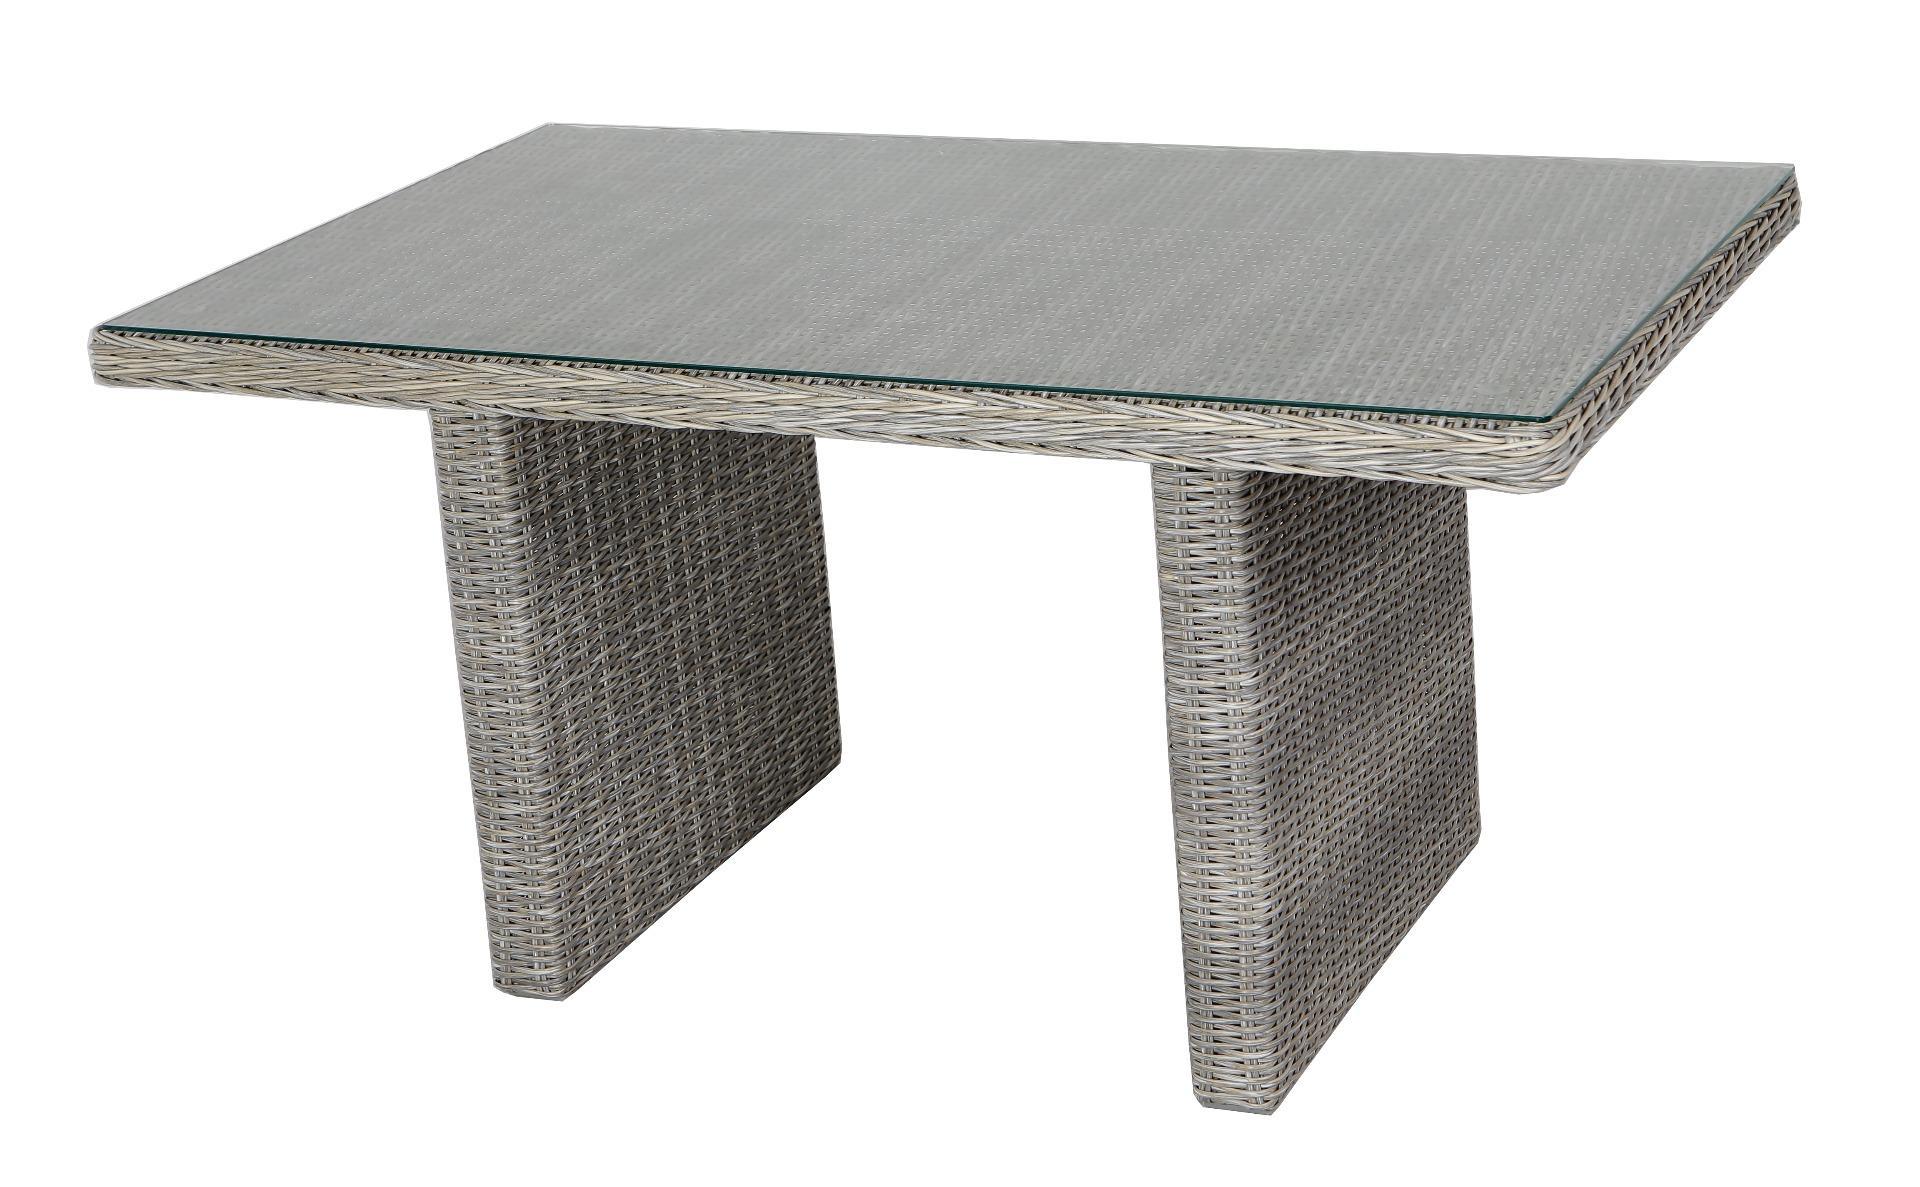 Bolzano column table 145x84x66 cm